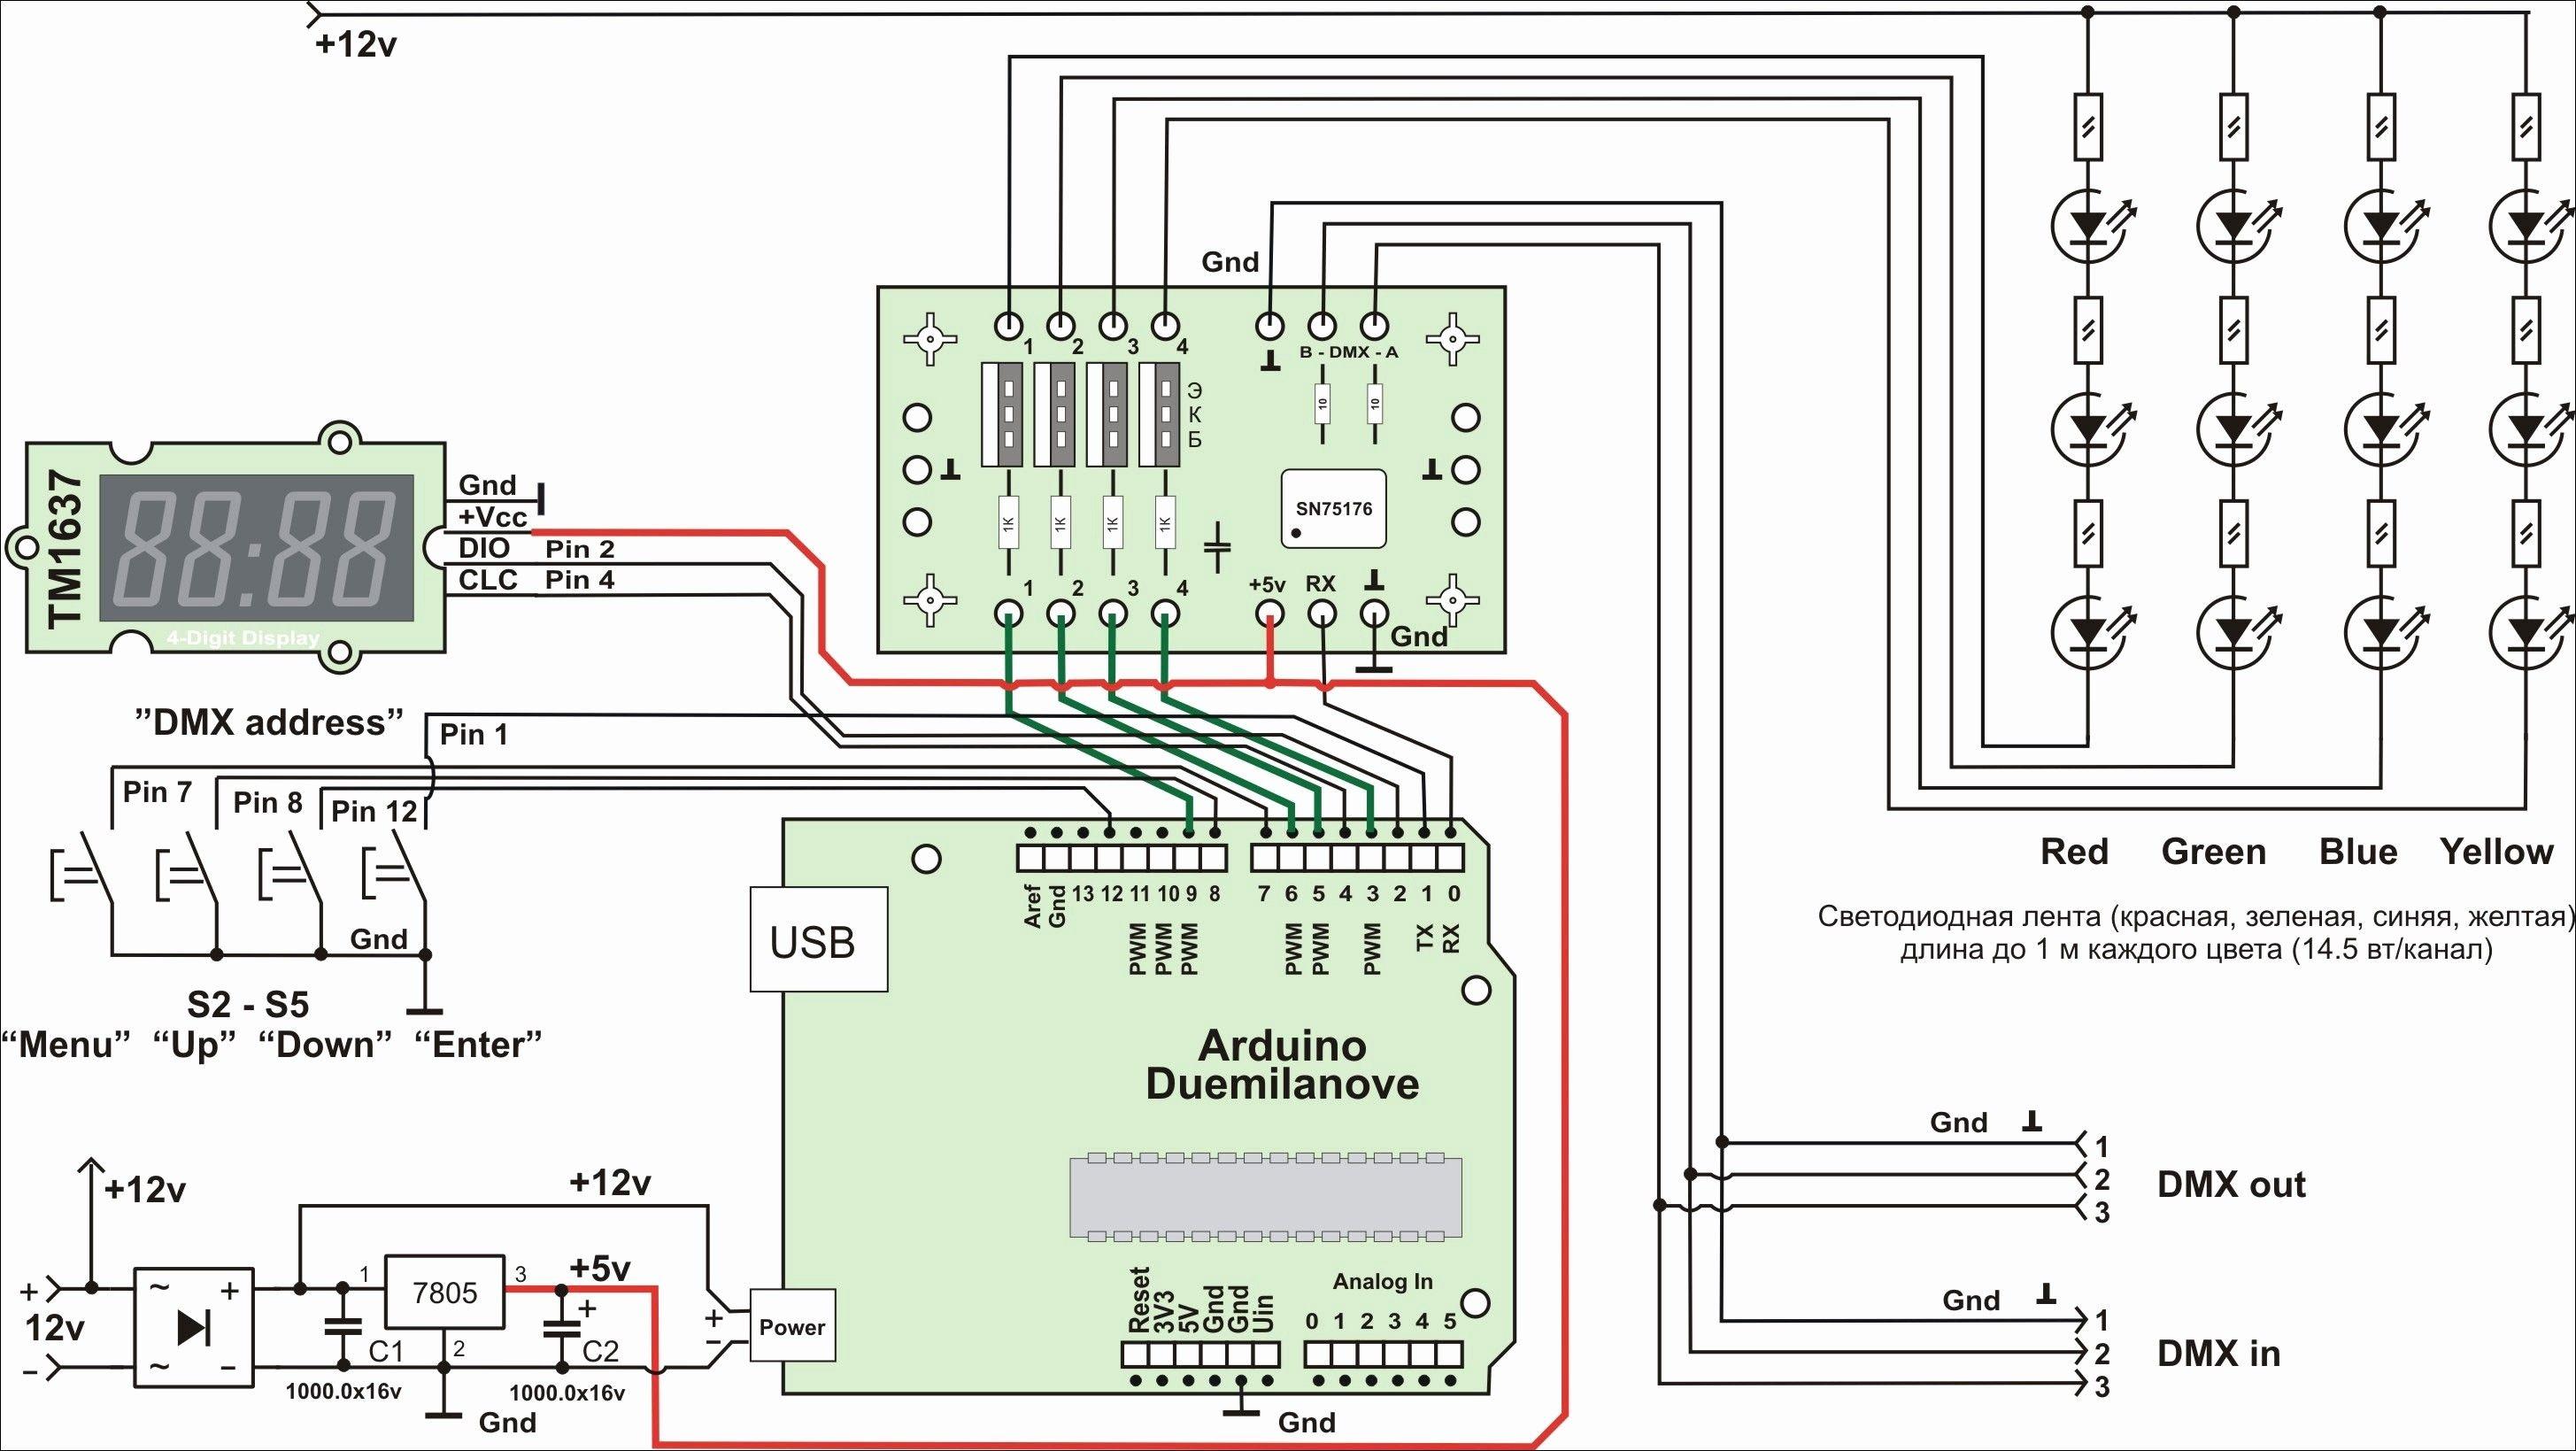 0 10 Volt Dimming Wiring Diagram In 2020 Dmx Dmx Lighting Led Lights